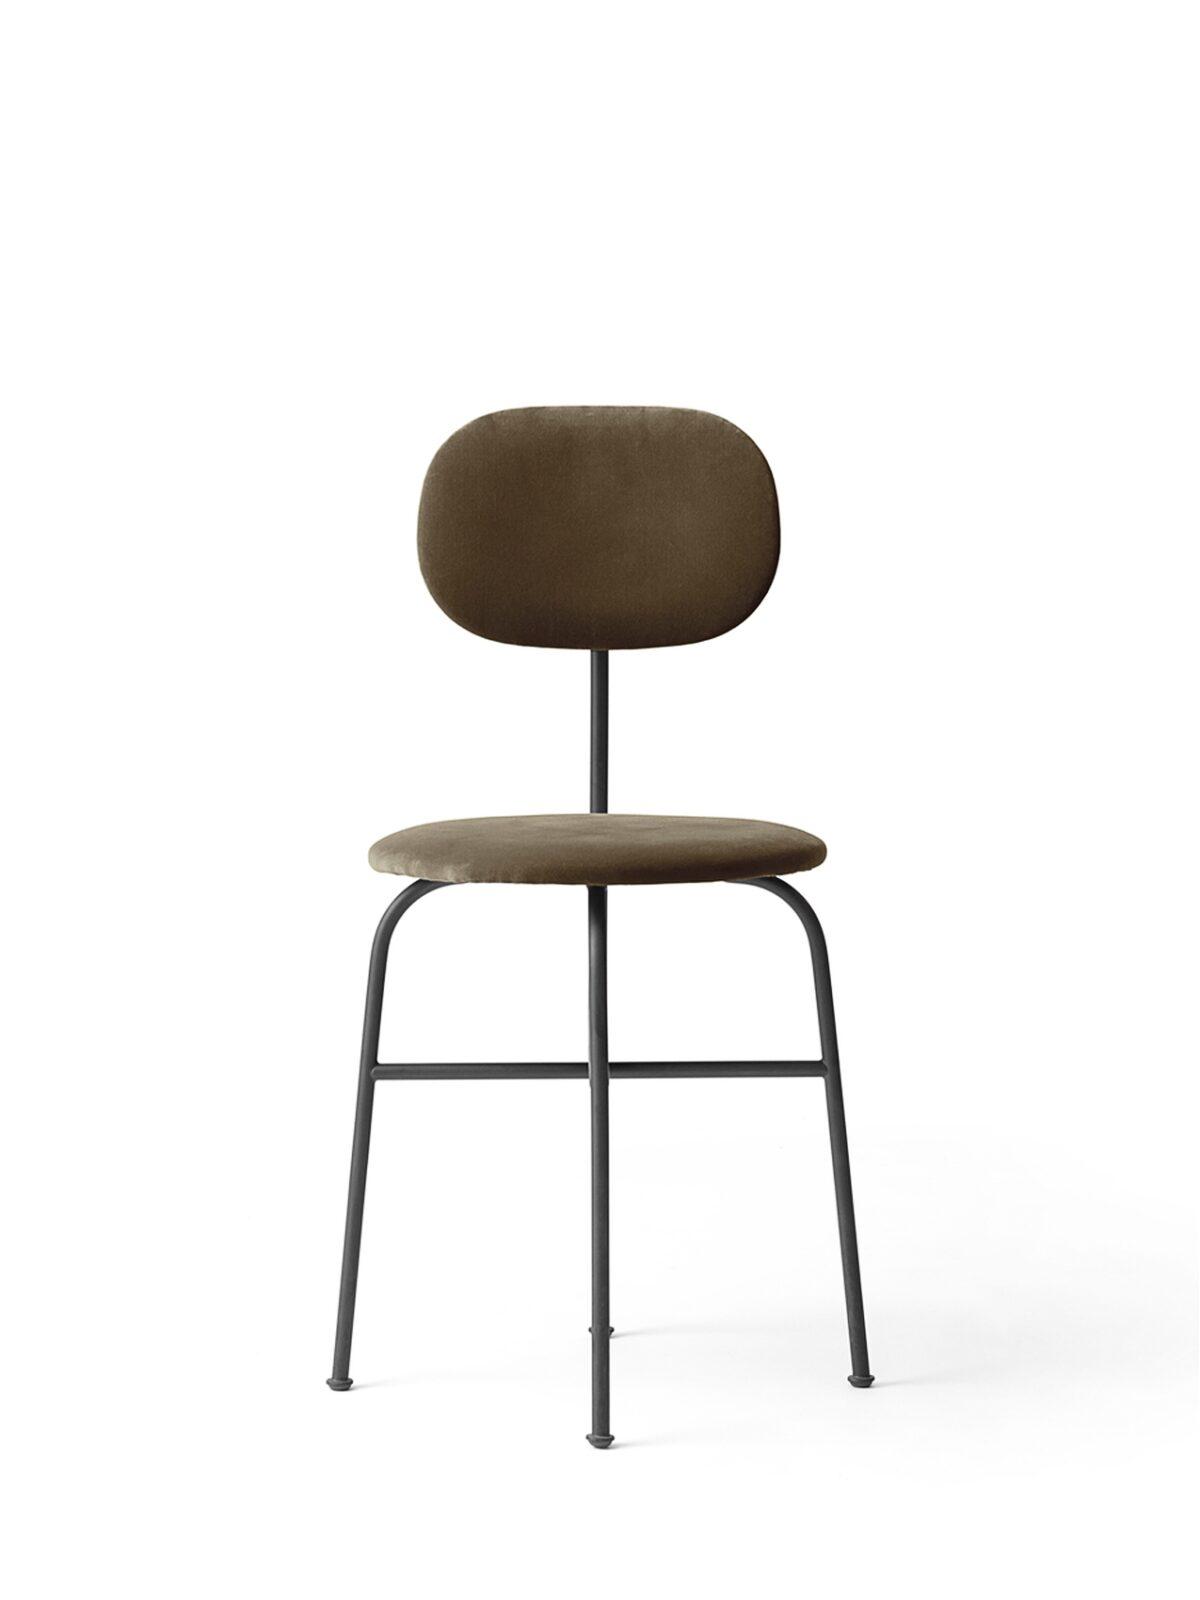 8465989 Afteroom Dining Chair Plus CityVelvetCA7832 078 Black Front